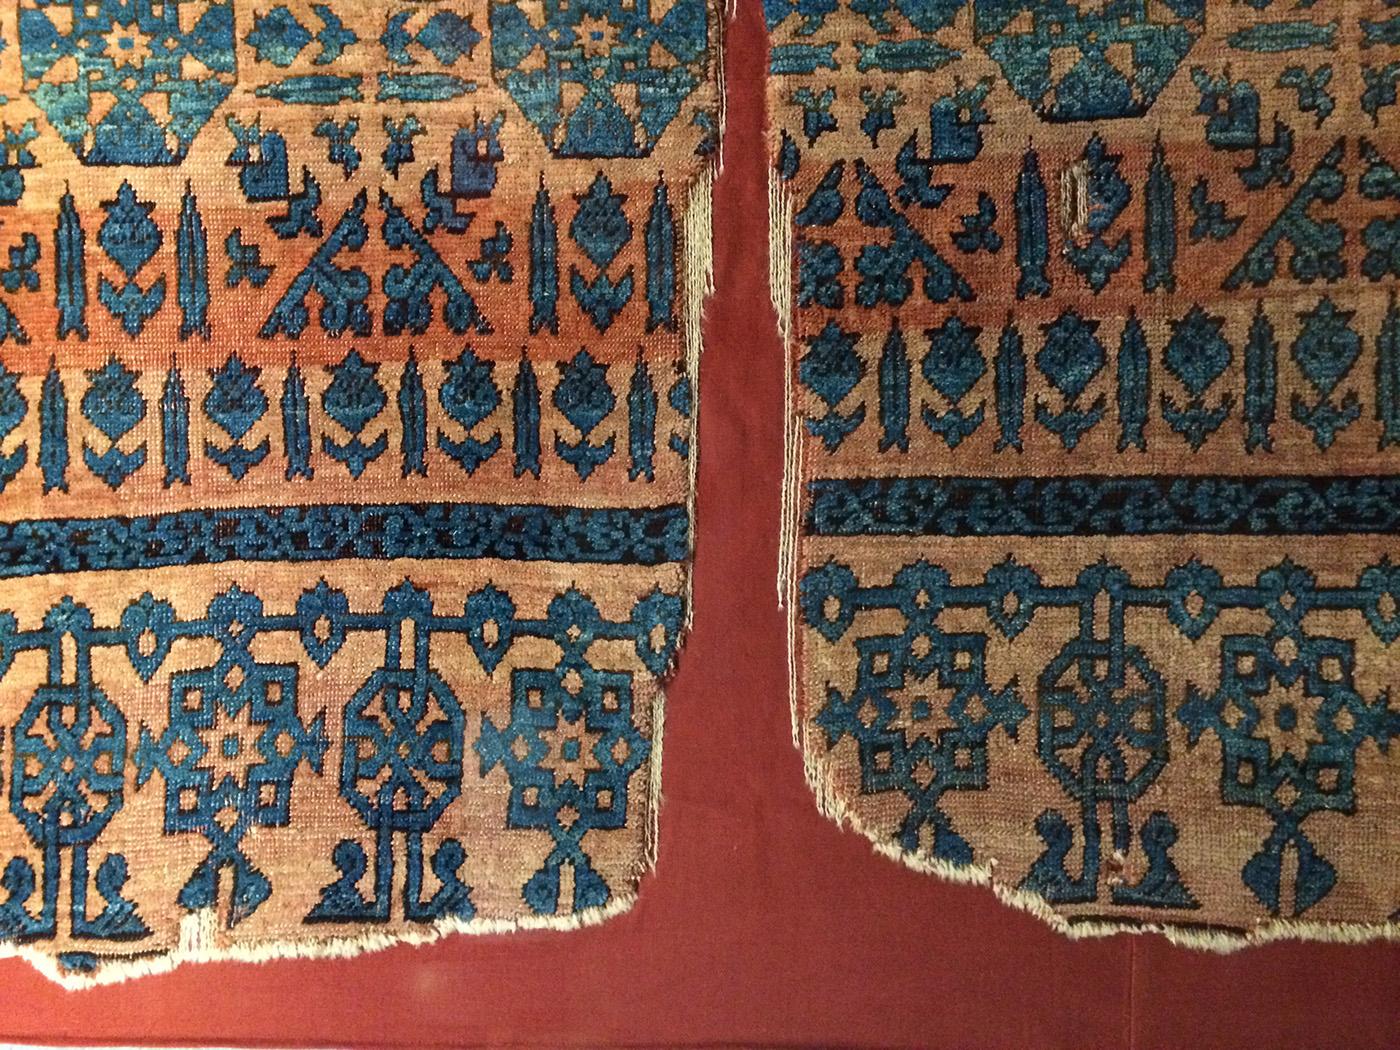 Seljuk Carpet 13th Century Turkey Vakiflar Carpet